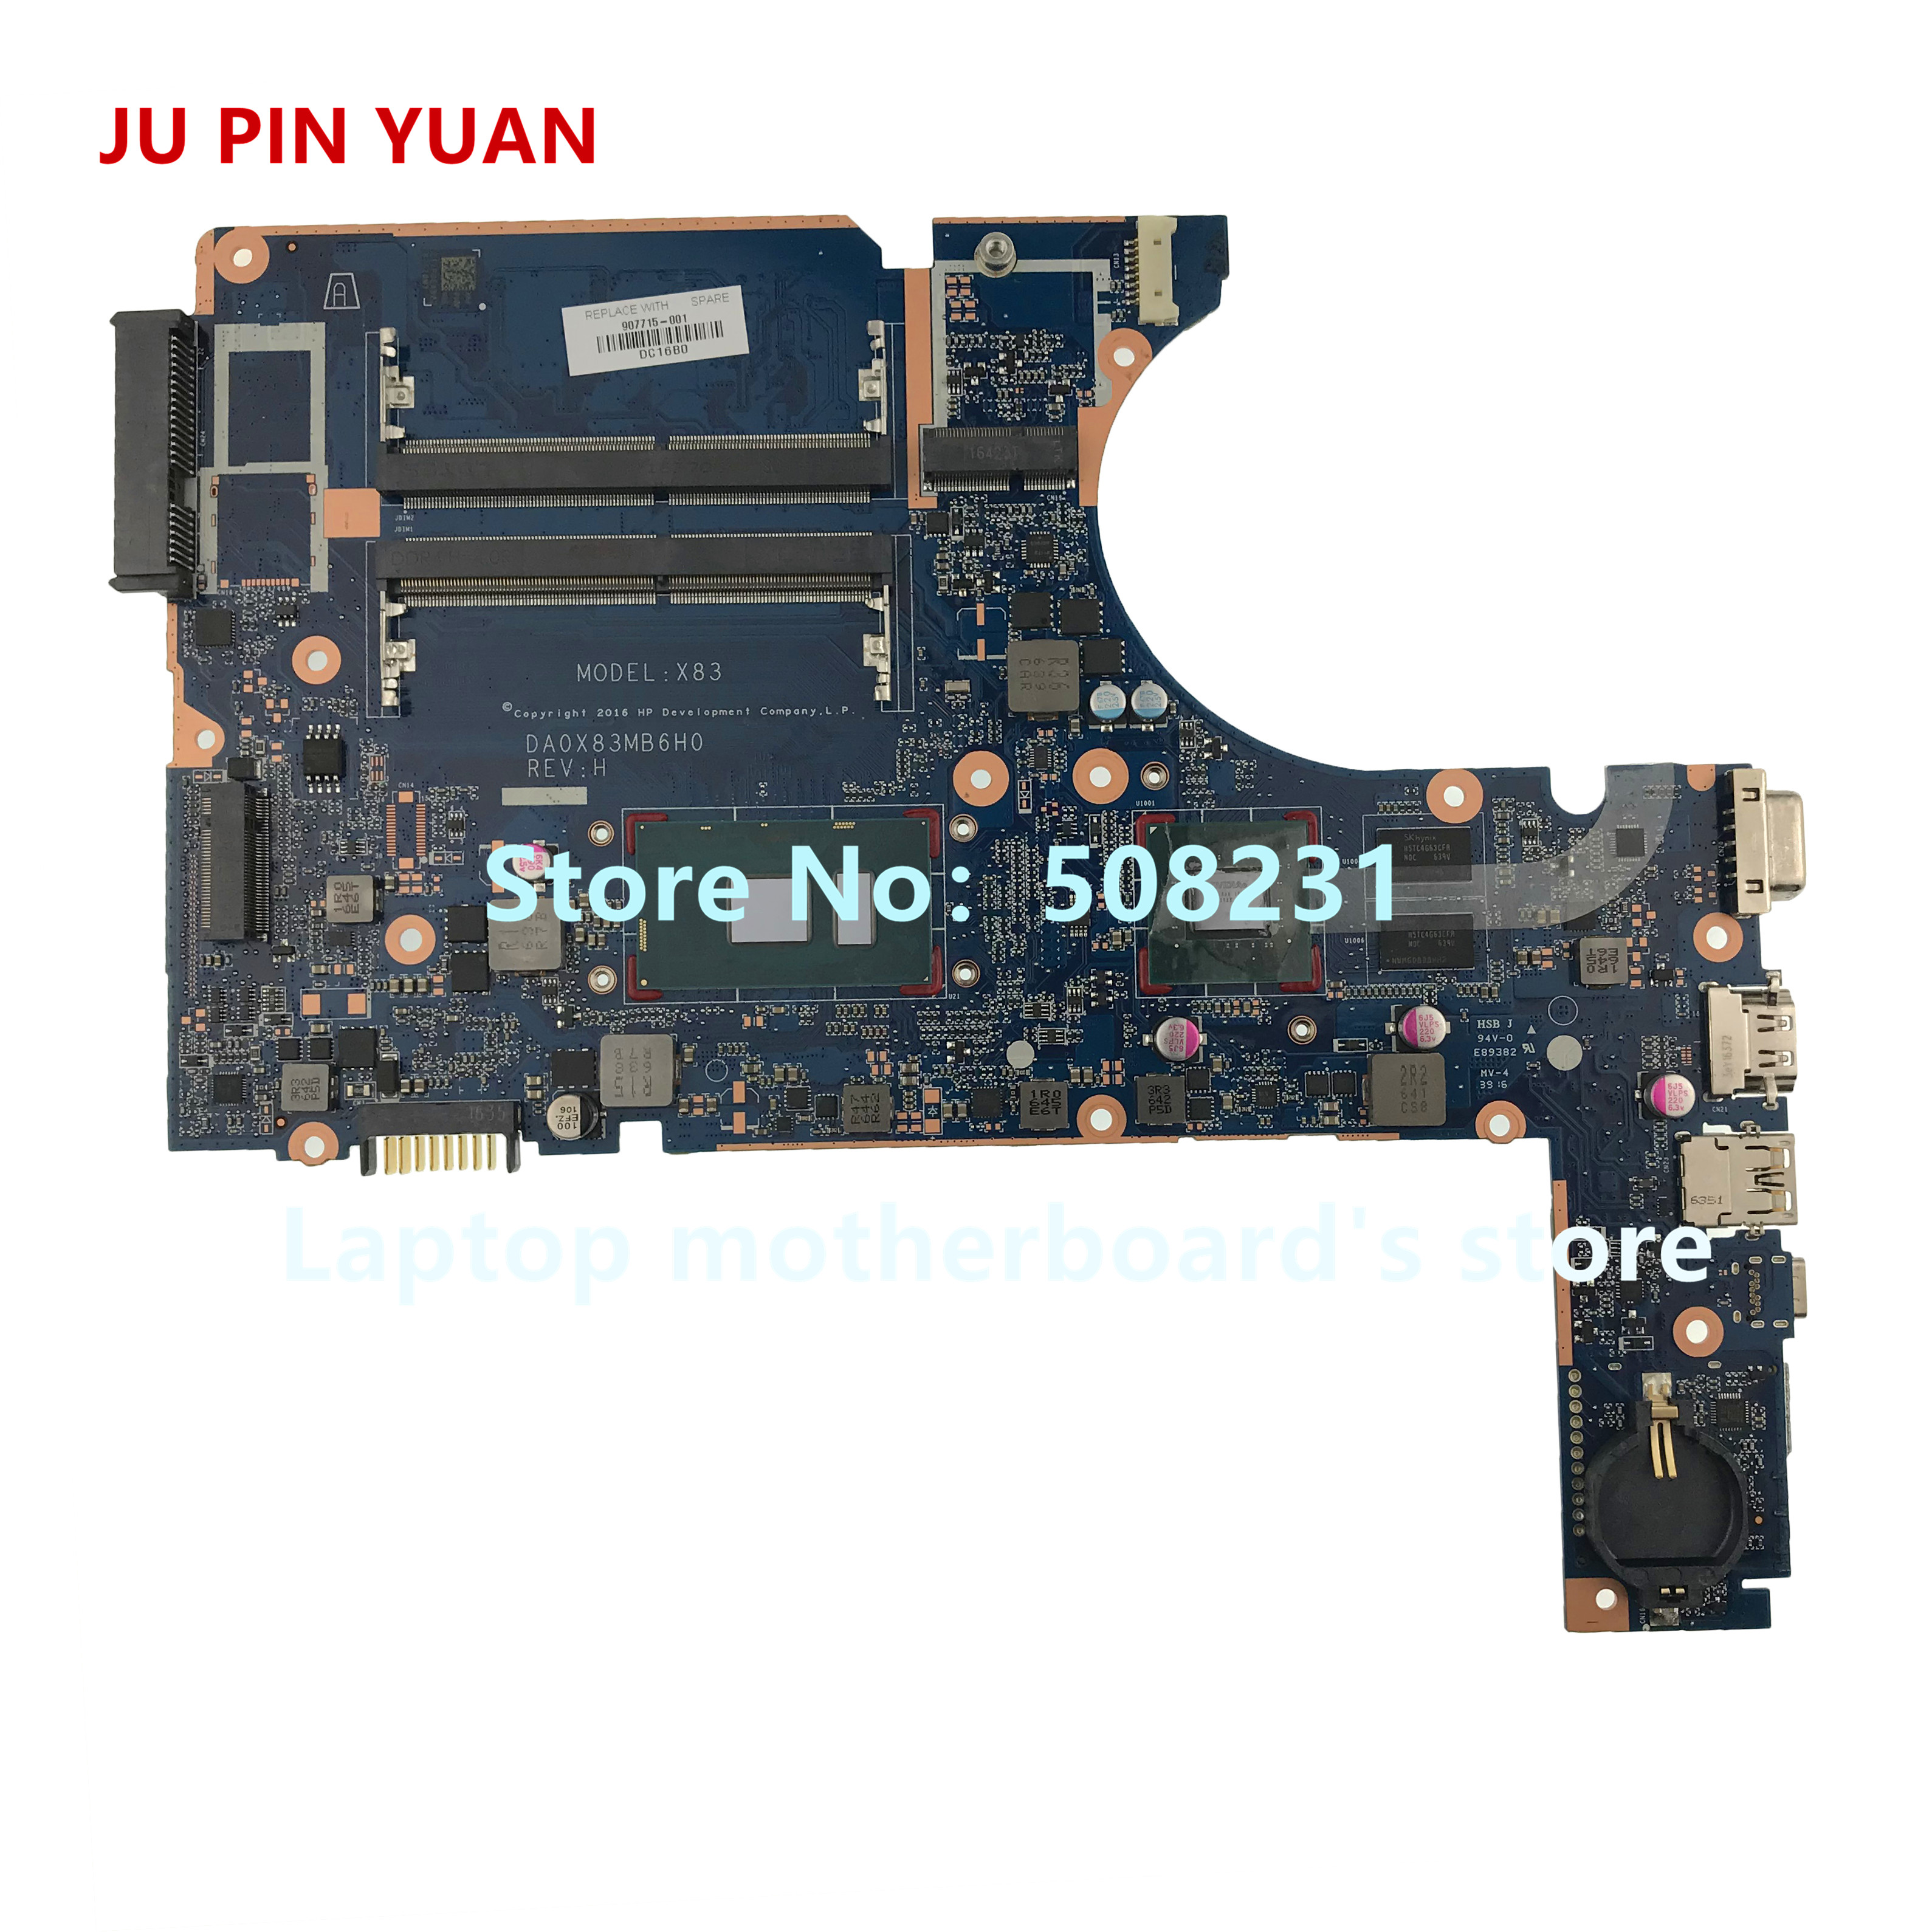 JU PIN YUAN pour HP ProBook 450 G4 470 G4 ordinateur portable PC 907715-601 907715-001 DA0X83MB6H0 ordinateur portable carte mère I7-7500U 930MX